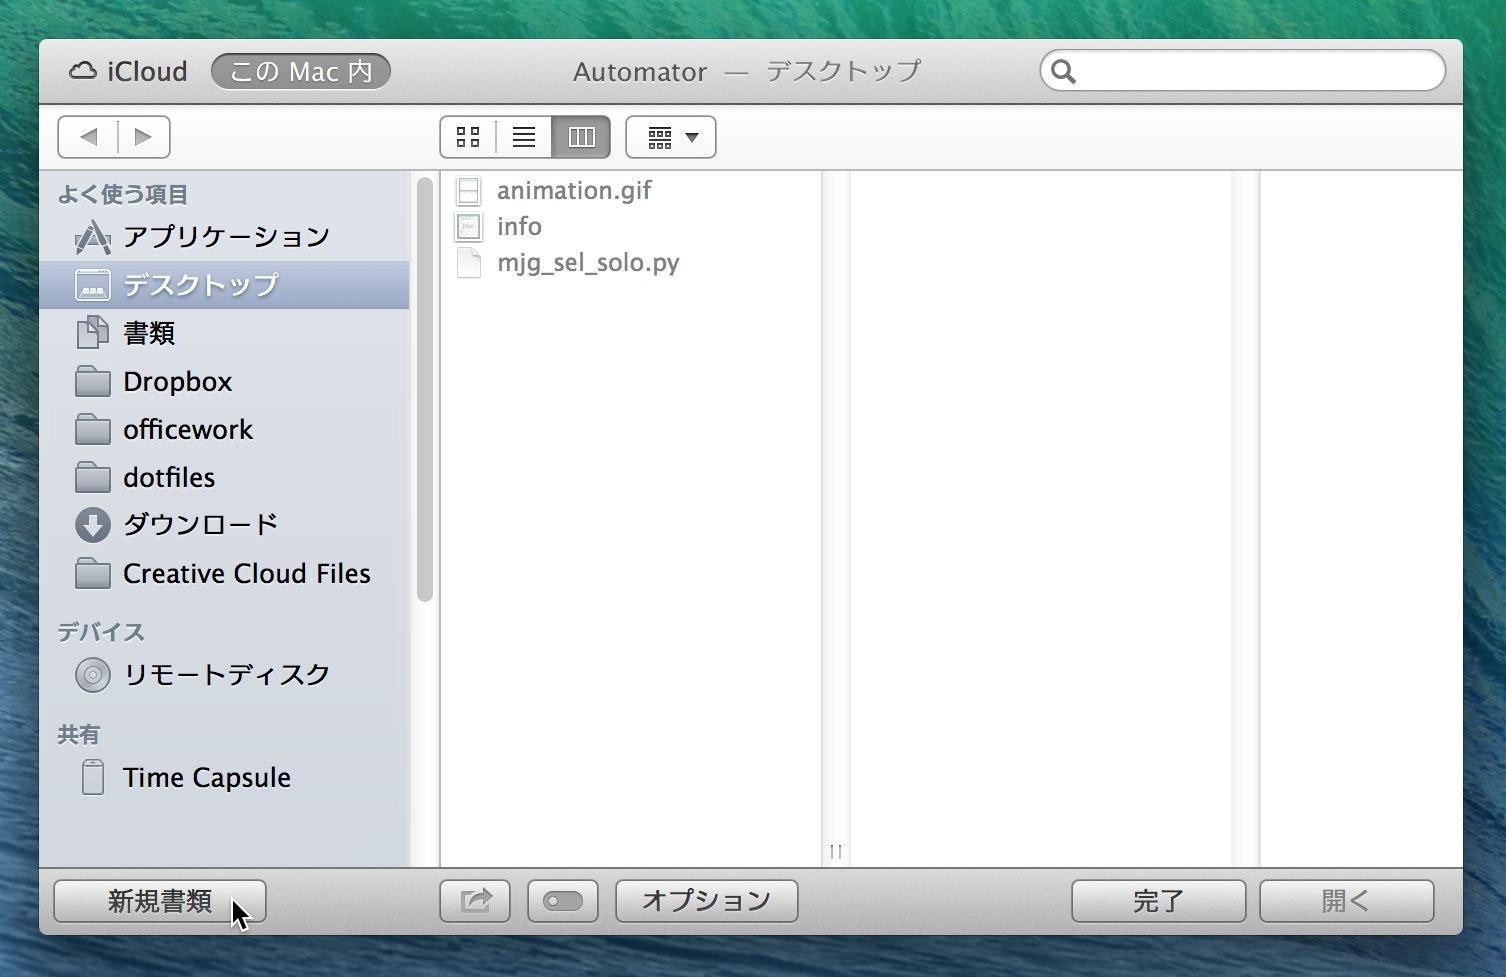 run_automator.jpg